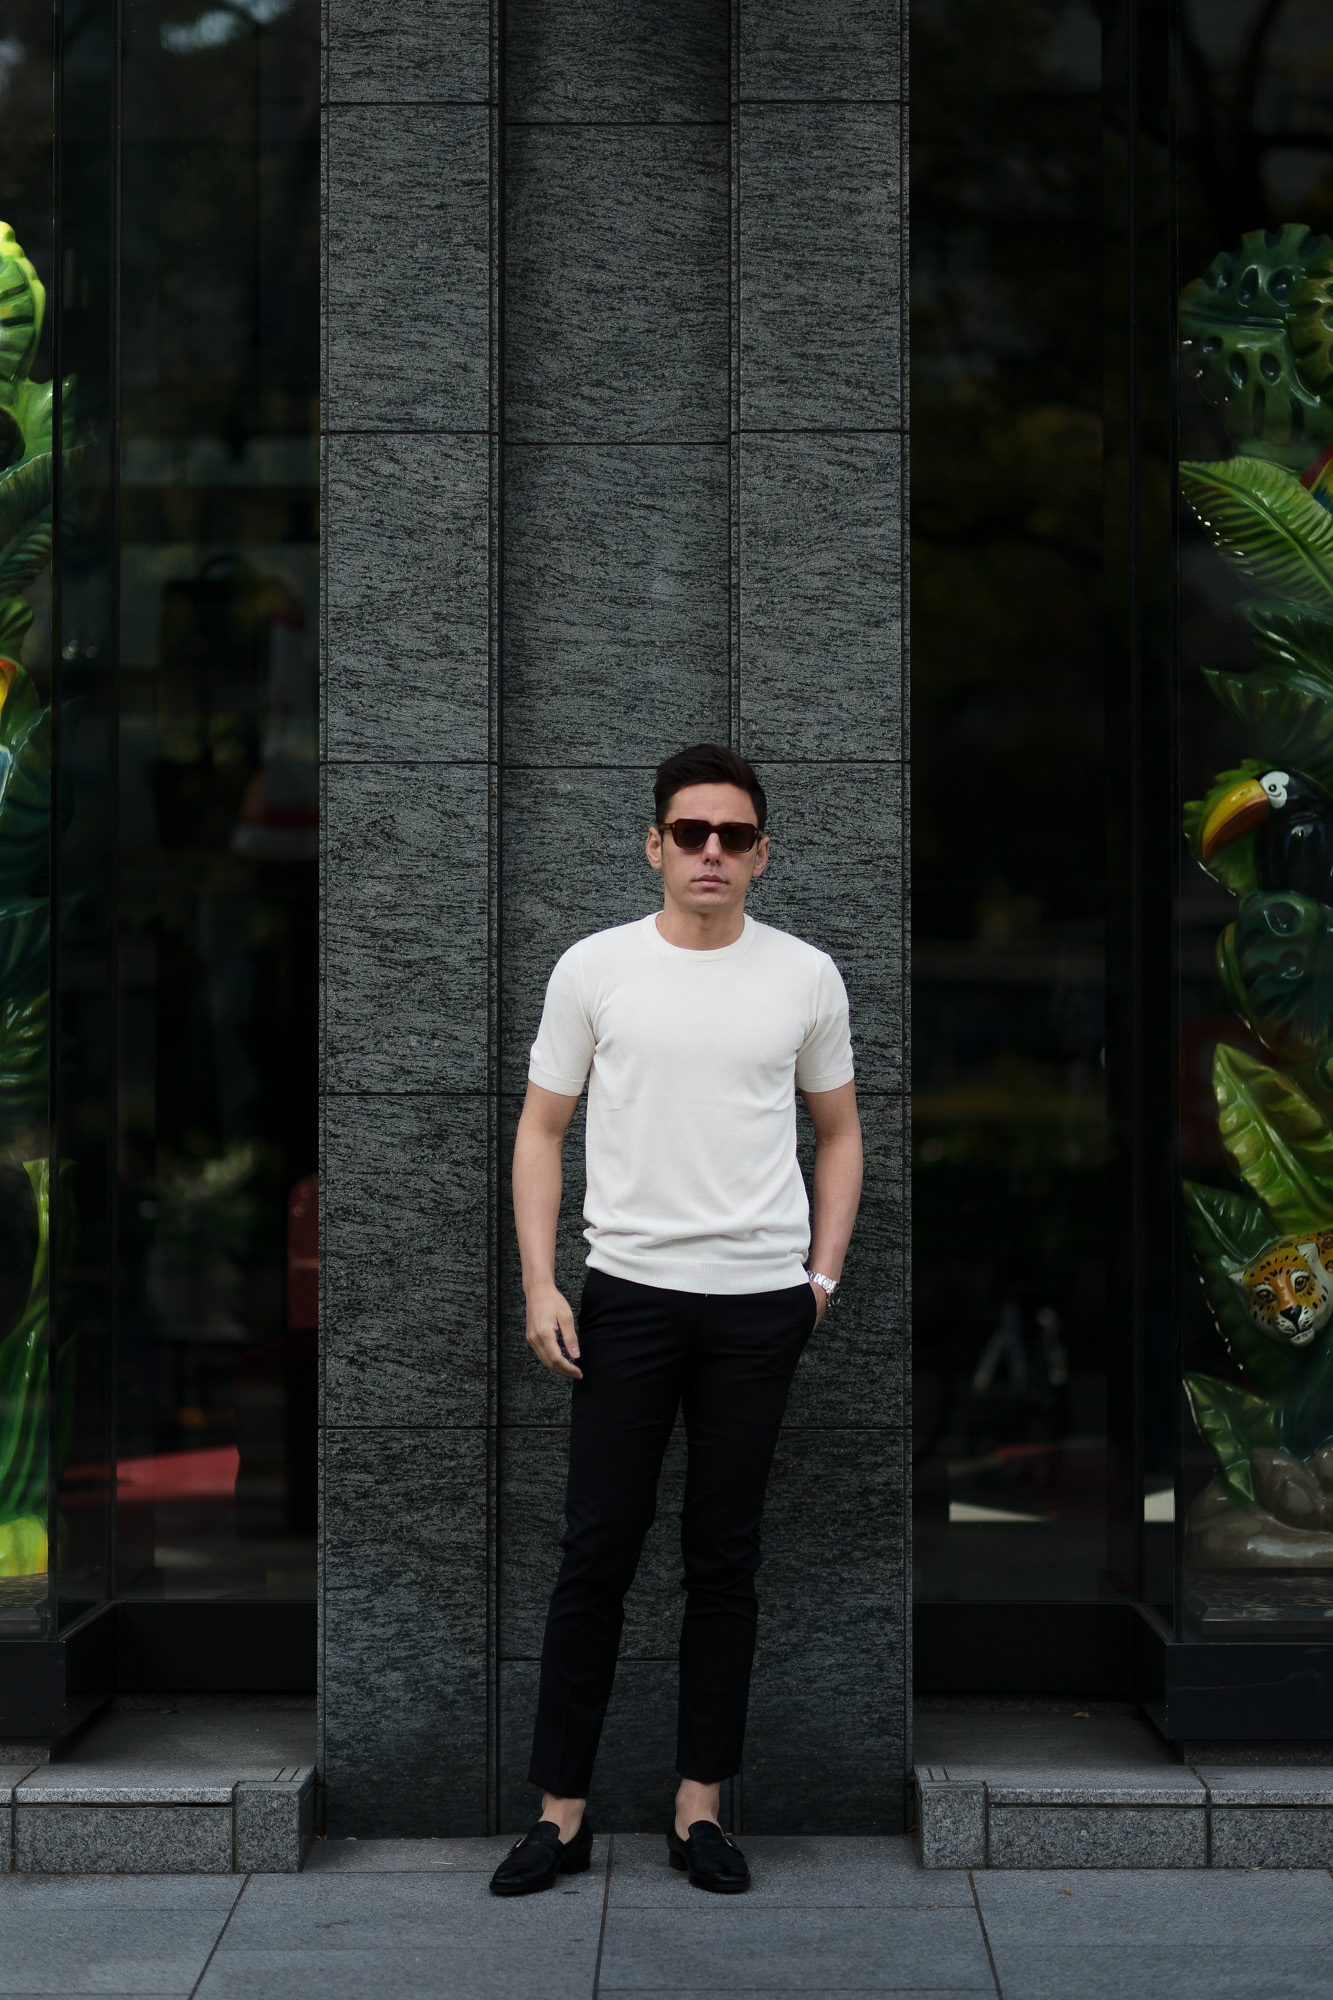 ZANONE(ザノーネ) Knit T-shirt (ニット Tシャツ) コットンニット Tシャツ WHITE (ホワイト・Z3372) made in italy (イタリア製) 2020 春夏新作  愛知 名古屋 altoediritto アルトエデリット